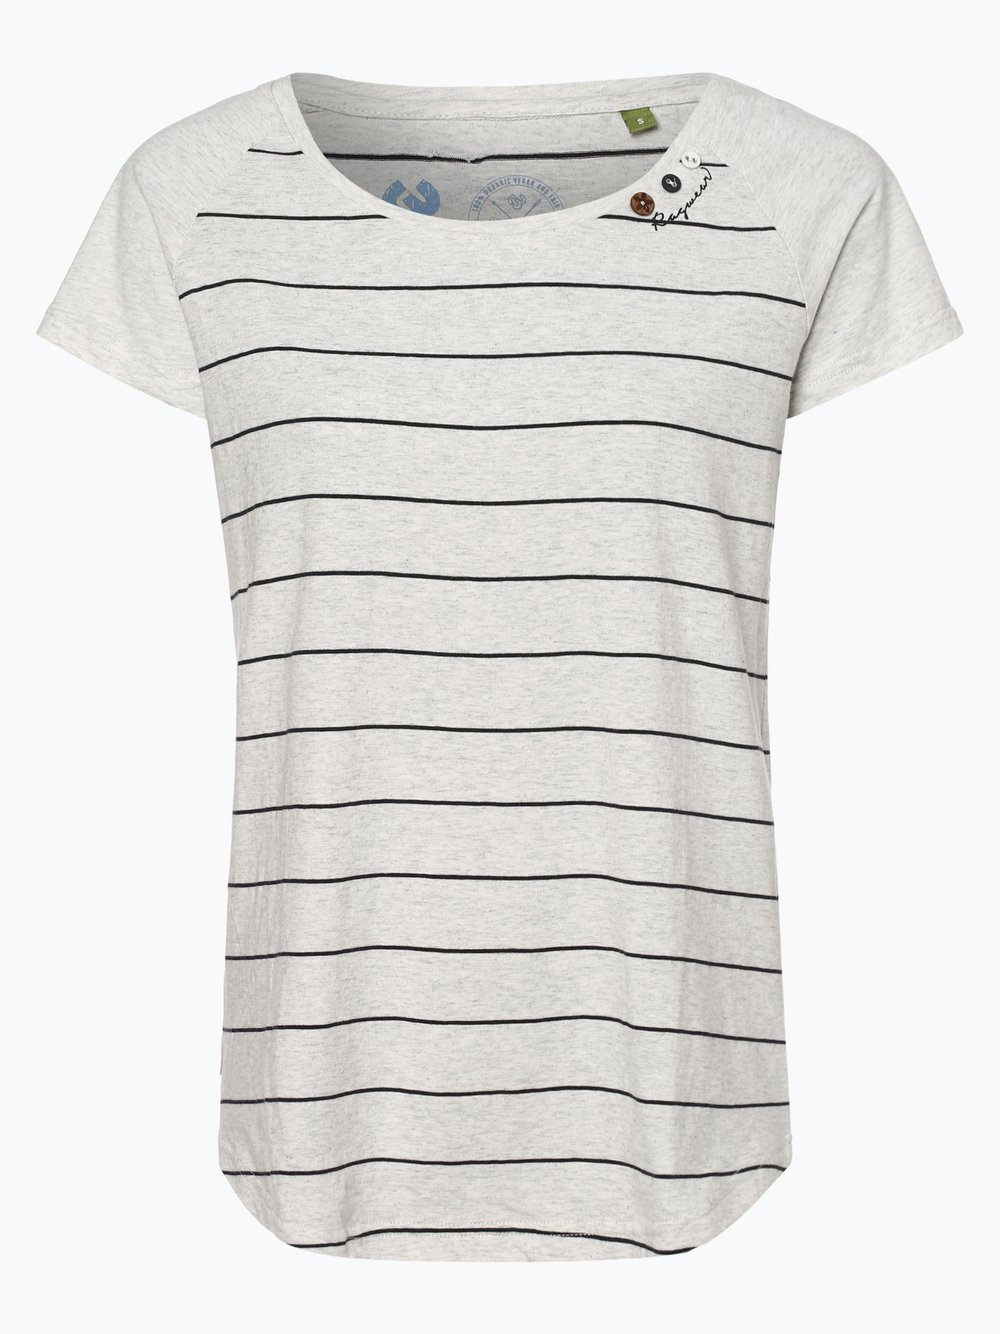 Ragwear – T-shirt damski – Mazik, biały Van Graaf 438109-0001